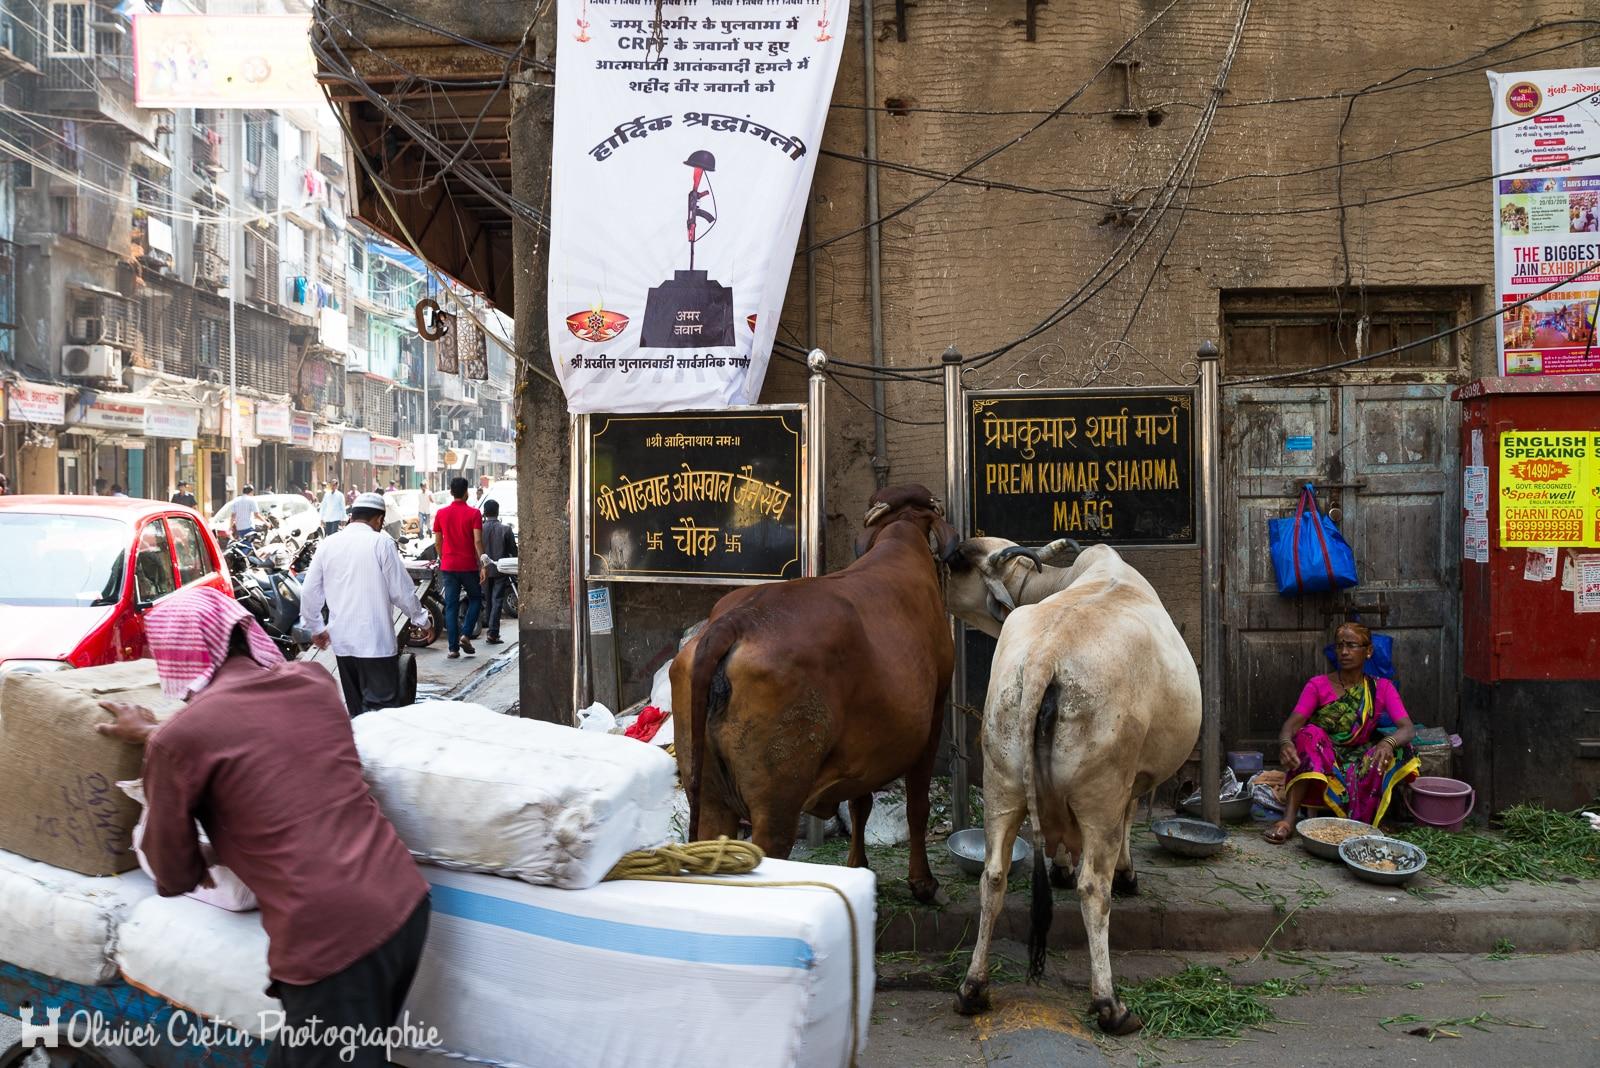 Inde - Mumbai - Scène champêtre de rue